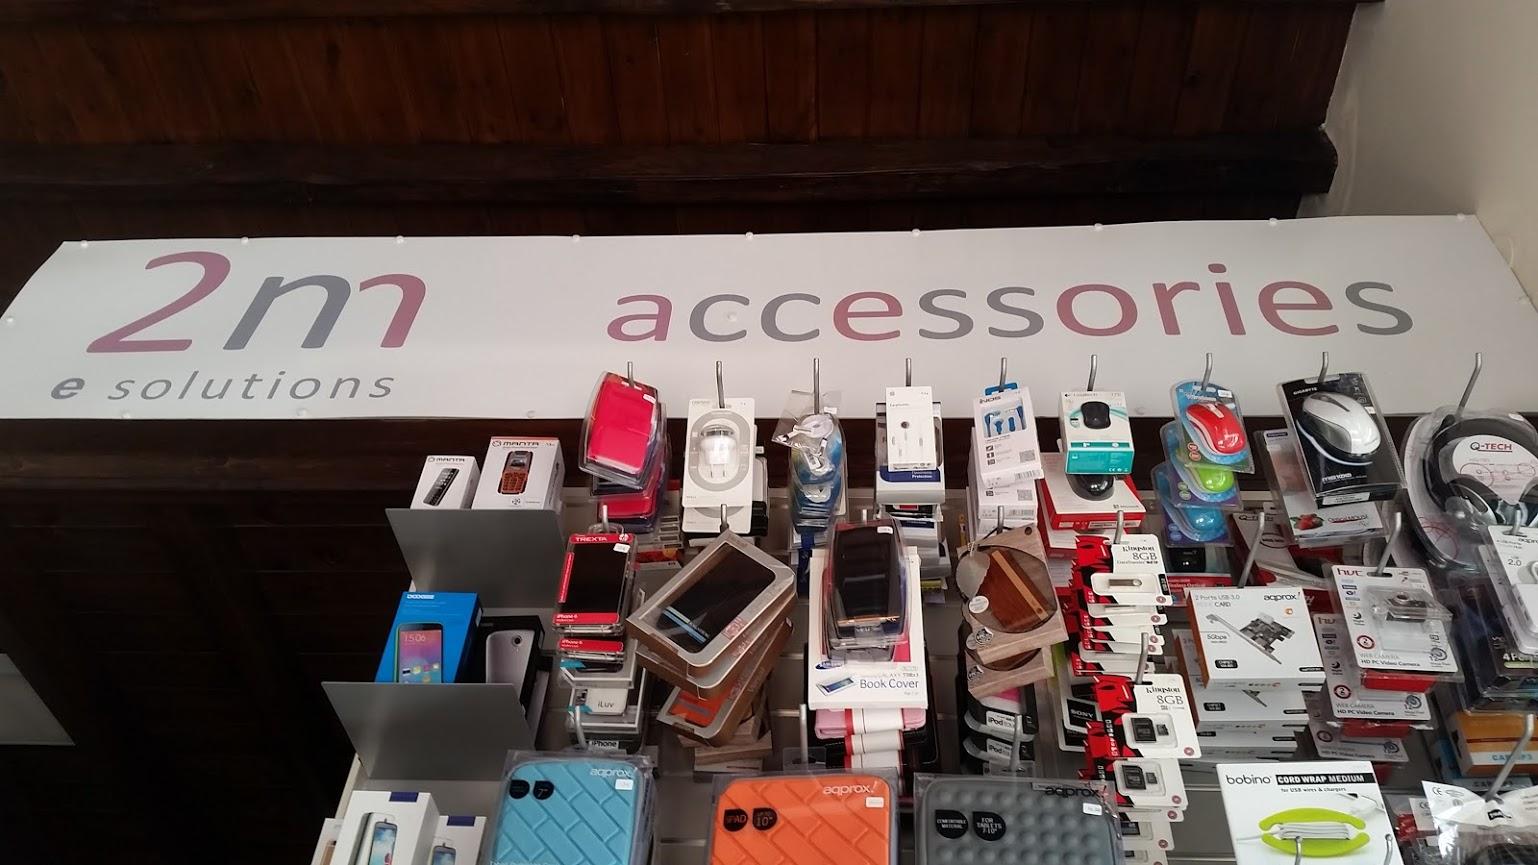 2nm-accessories